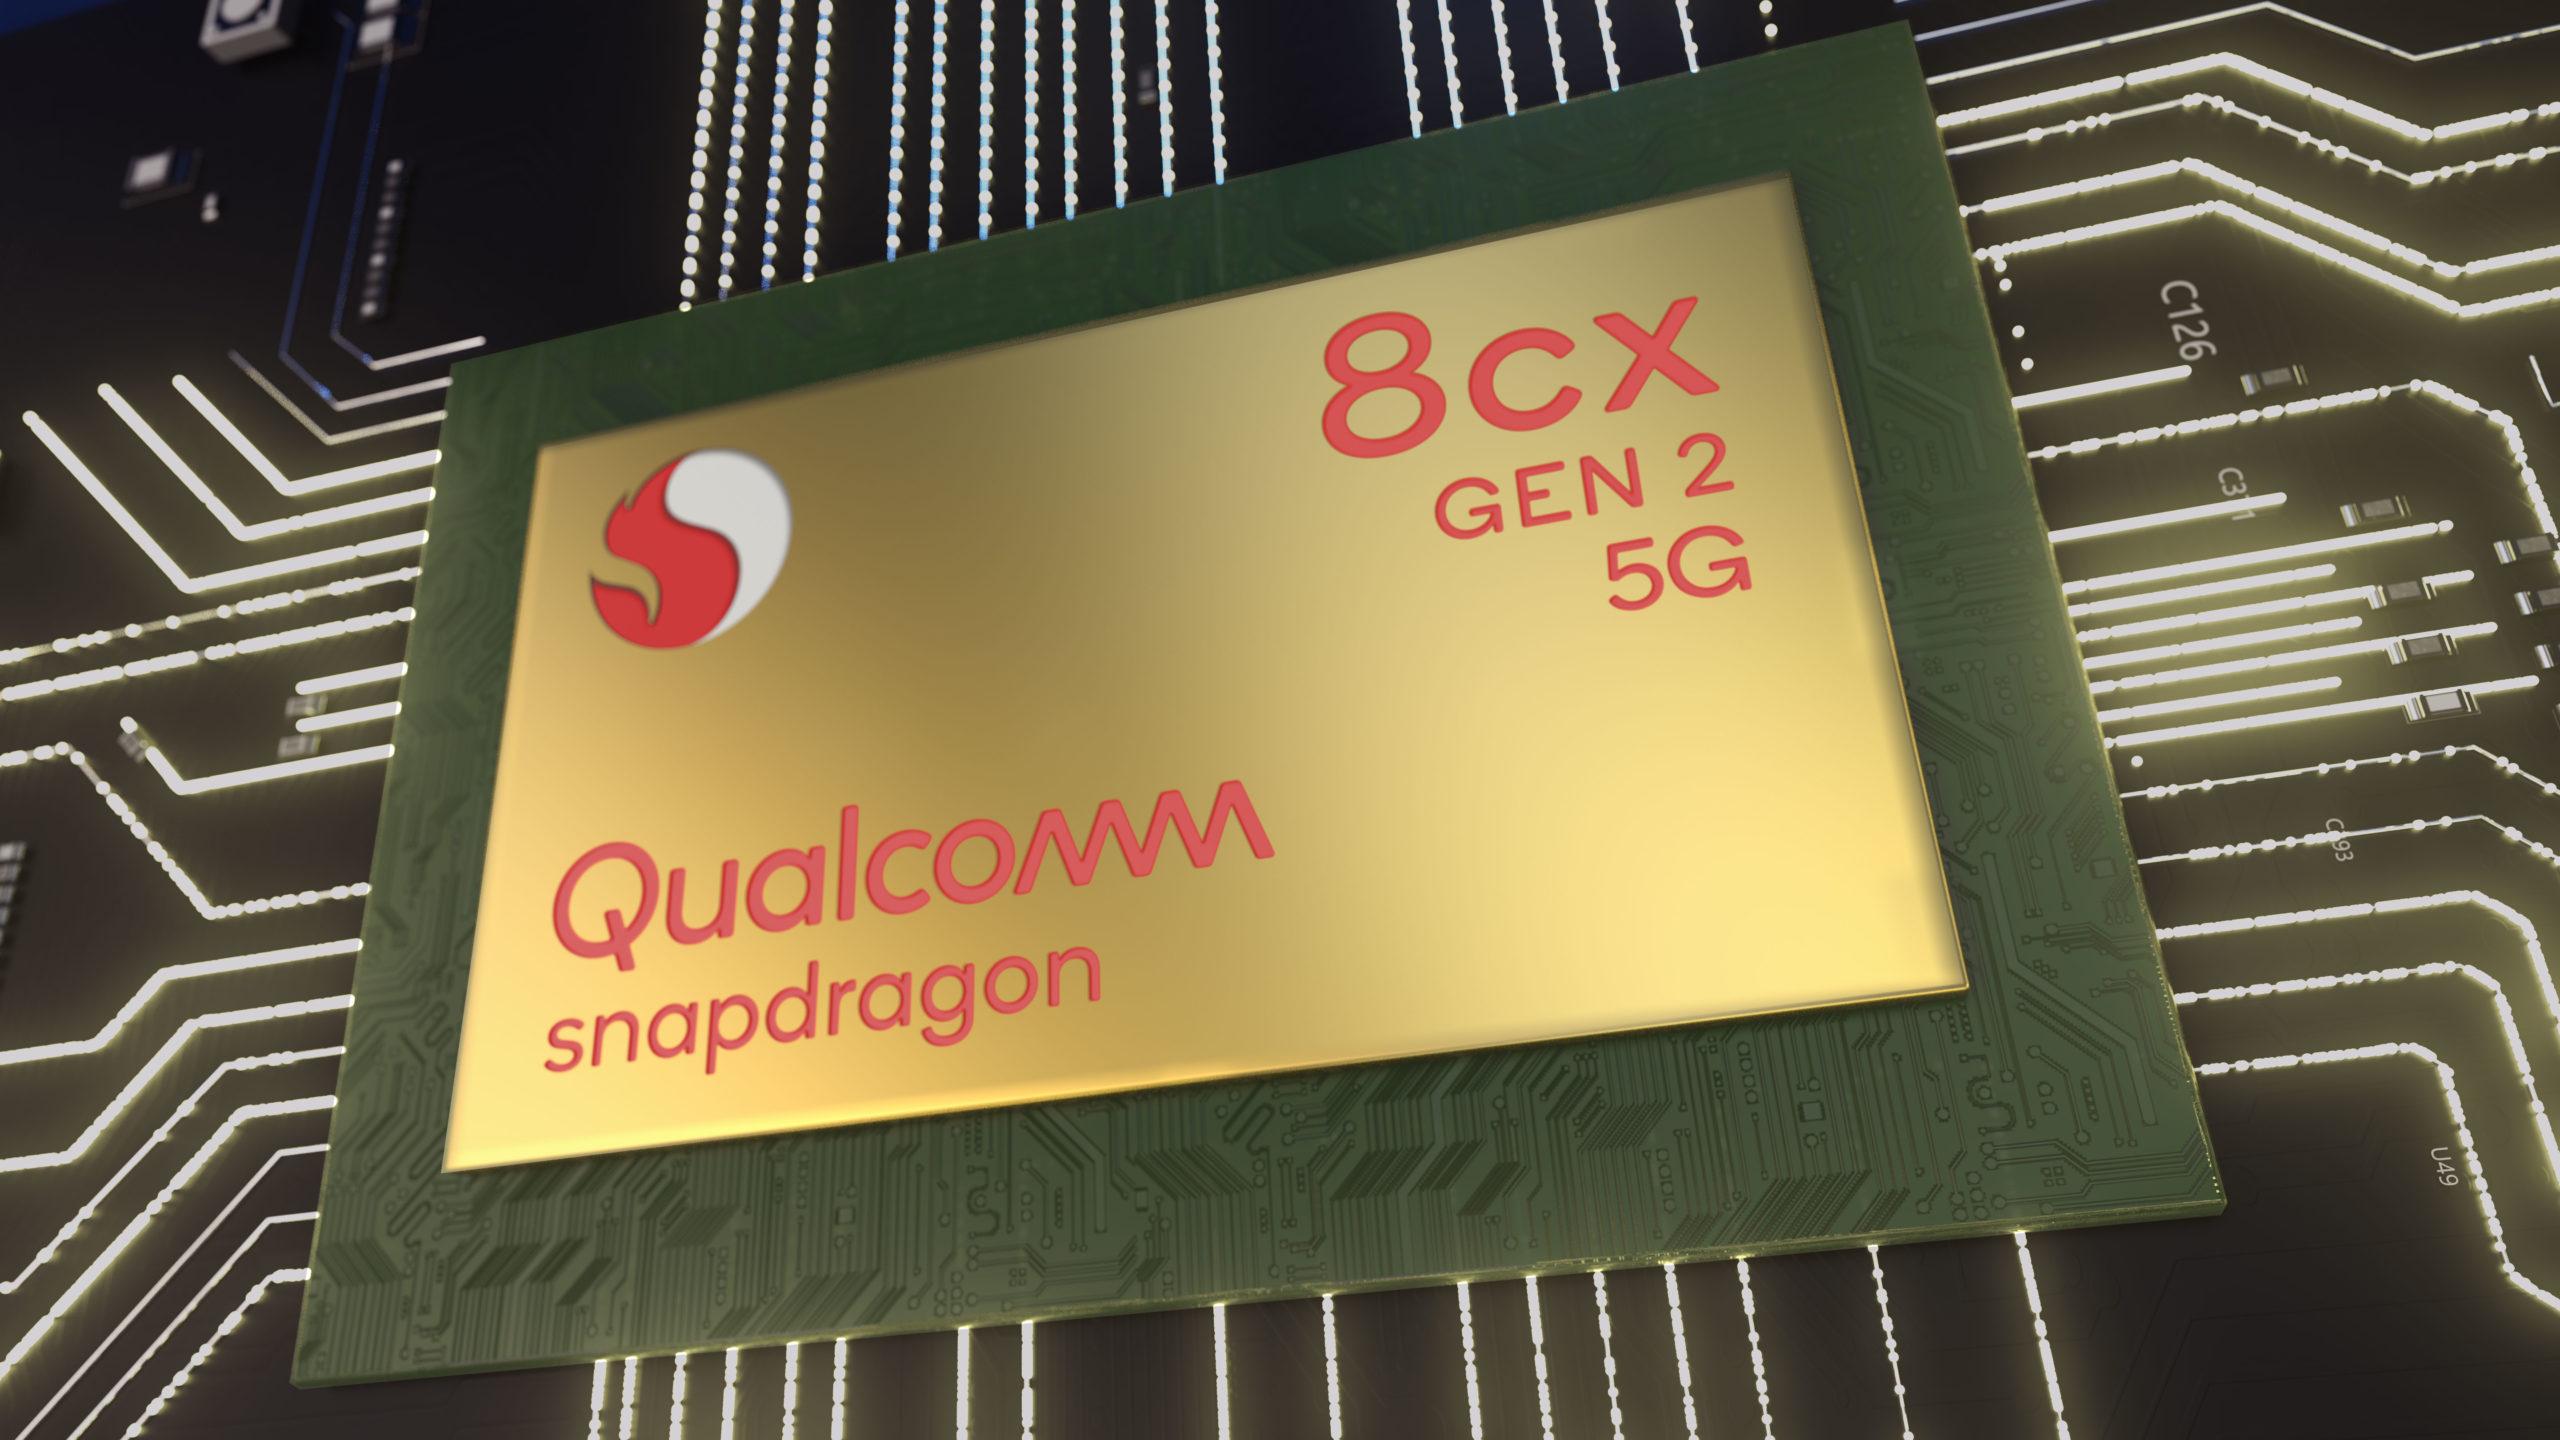 Qualcomm's Snapdragon 8cx Gen 2 5G platform surpasses Intel's 10th Gen Core i5 by up to 18% 13